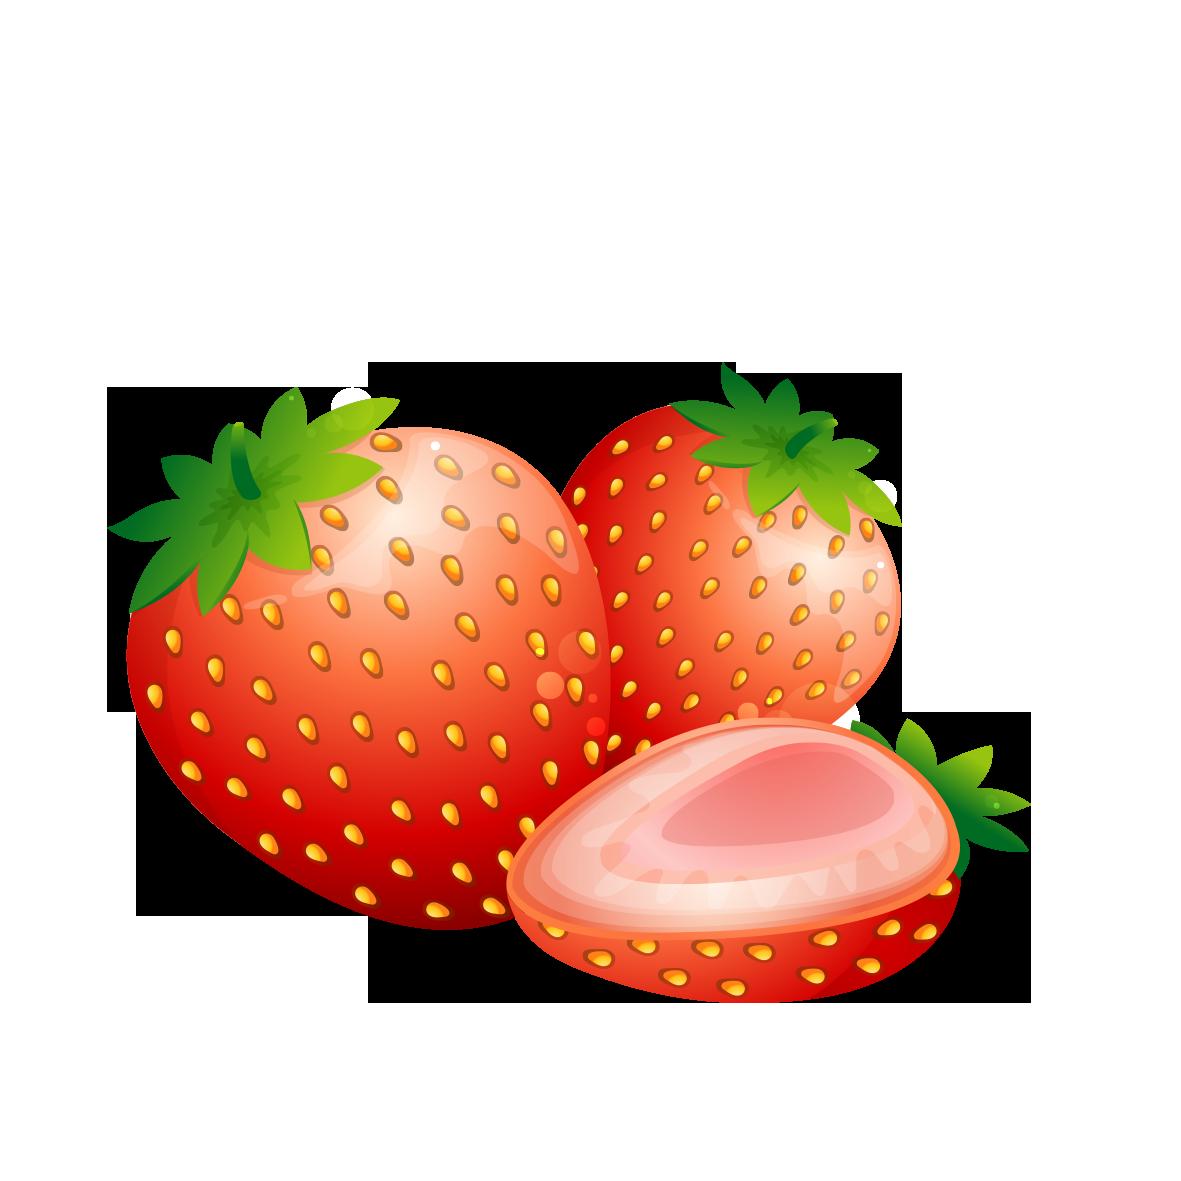 Strawberries clipart lemon fruit. Strawberry aedmaasikas food cartoon